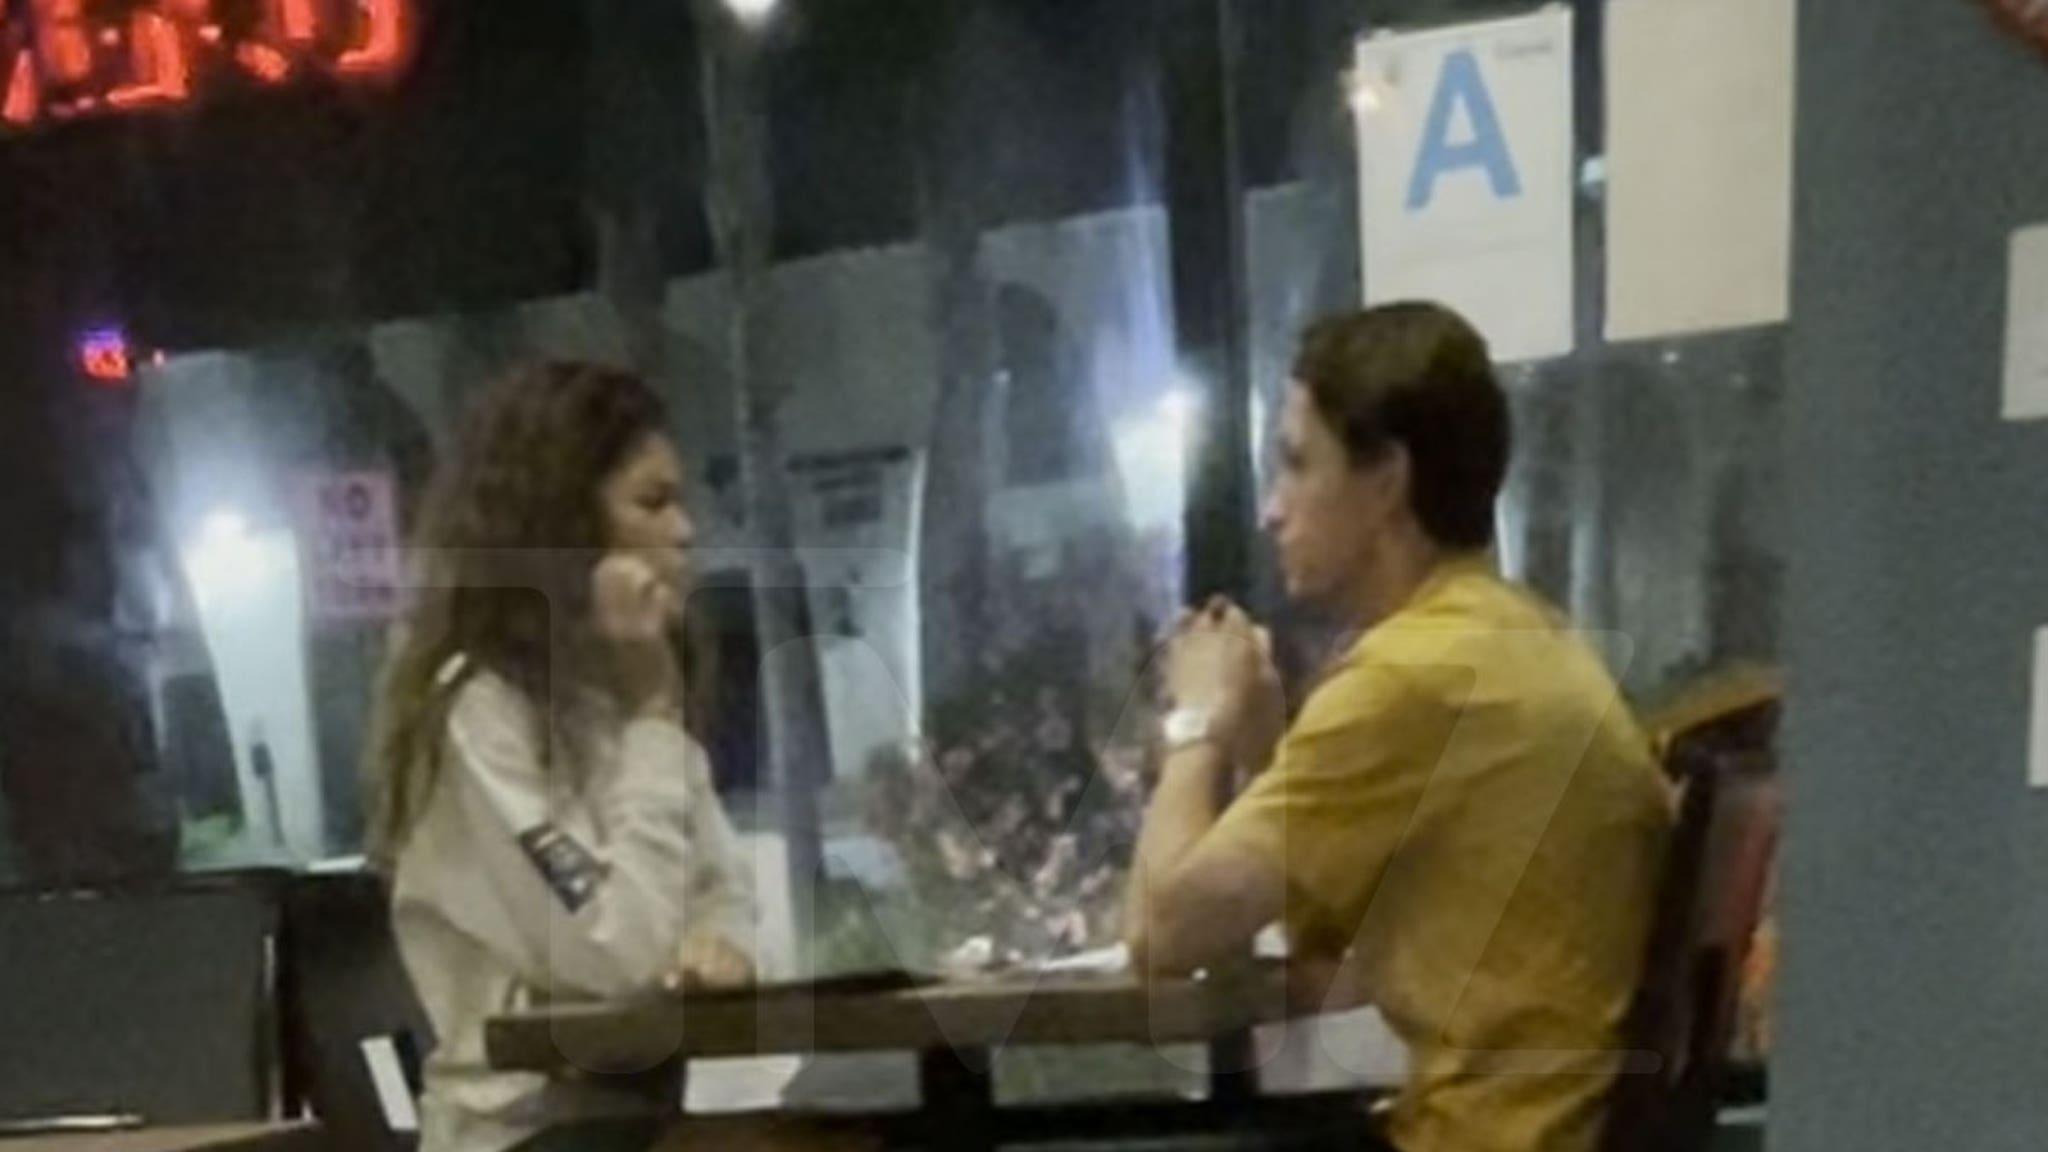 Zendaya & Tom Holland Grabbed Date Night Thai Day Before Going Public